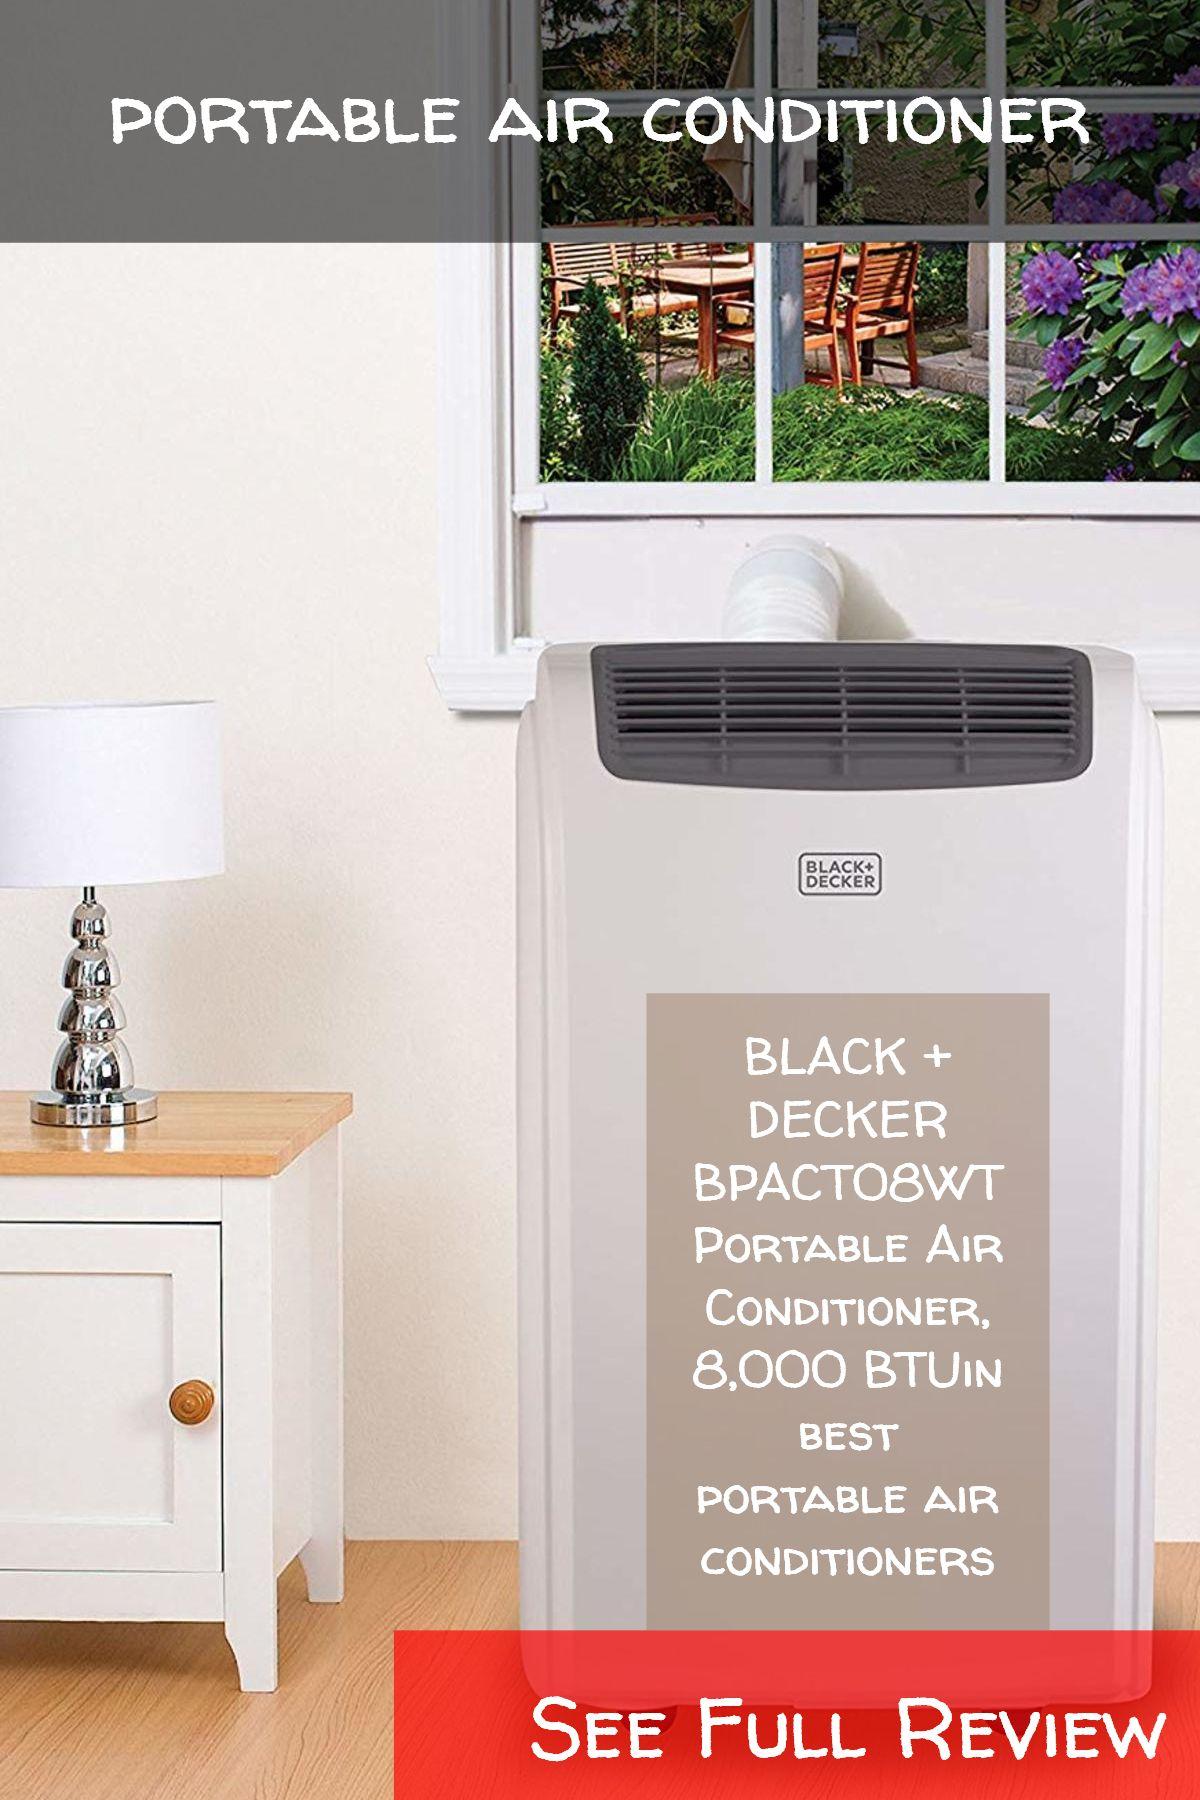 portable air conditioner / BLACK + DECKER BPACT08WT